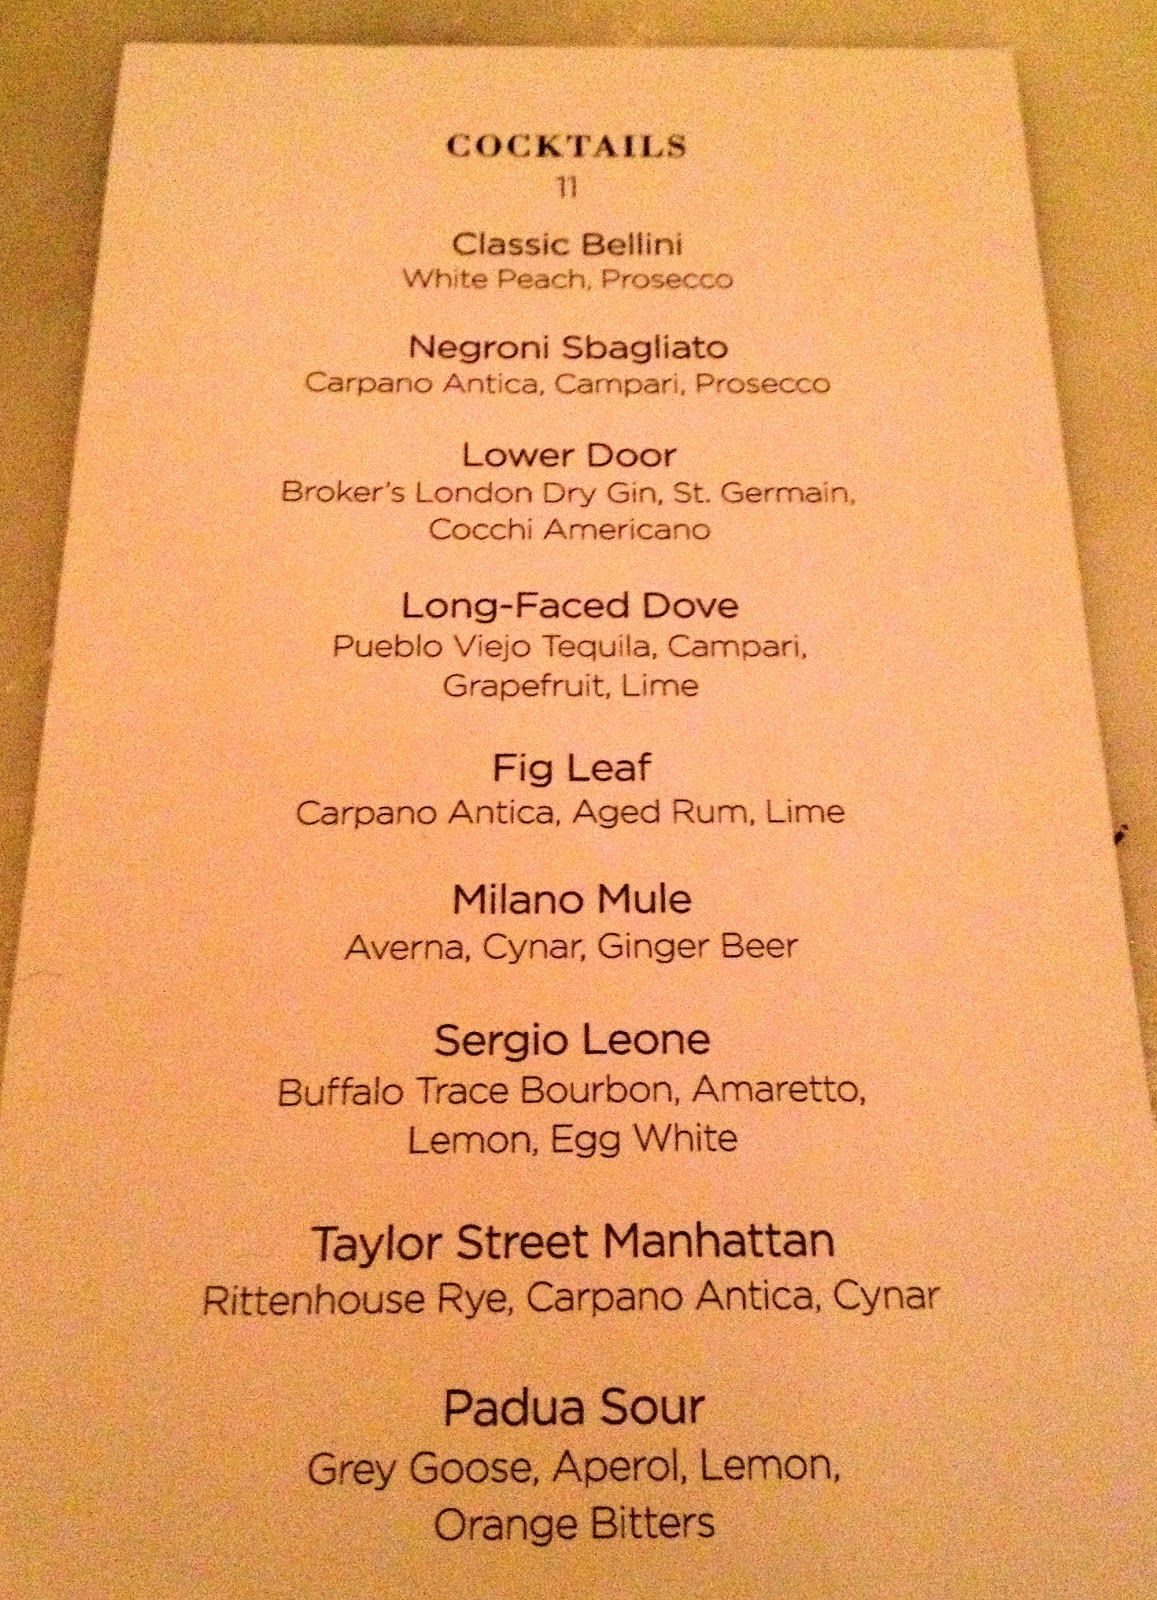 Gordon Ramsay Pub and Grill menu | Menus | Pinterest | Gordon ...